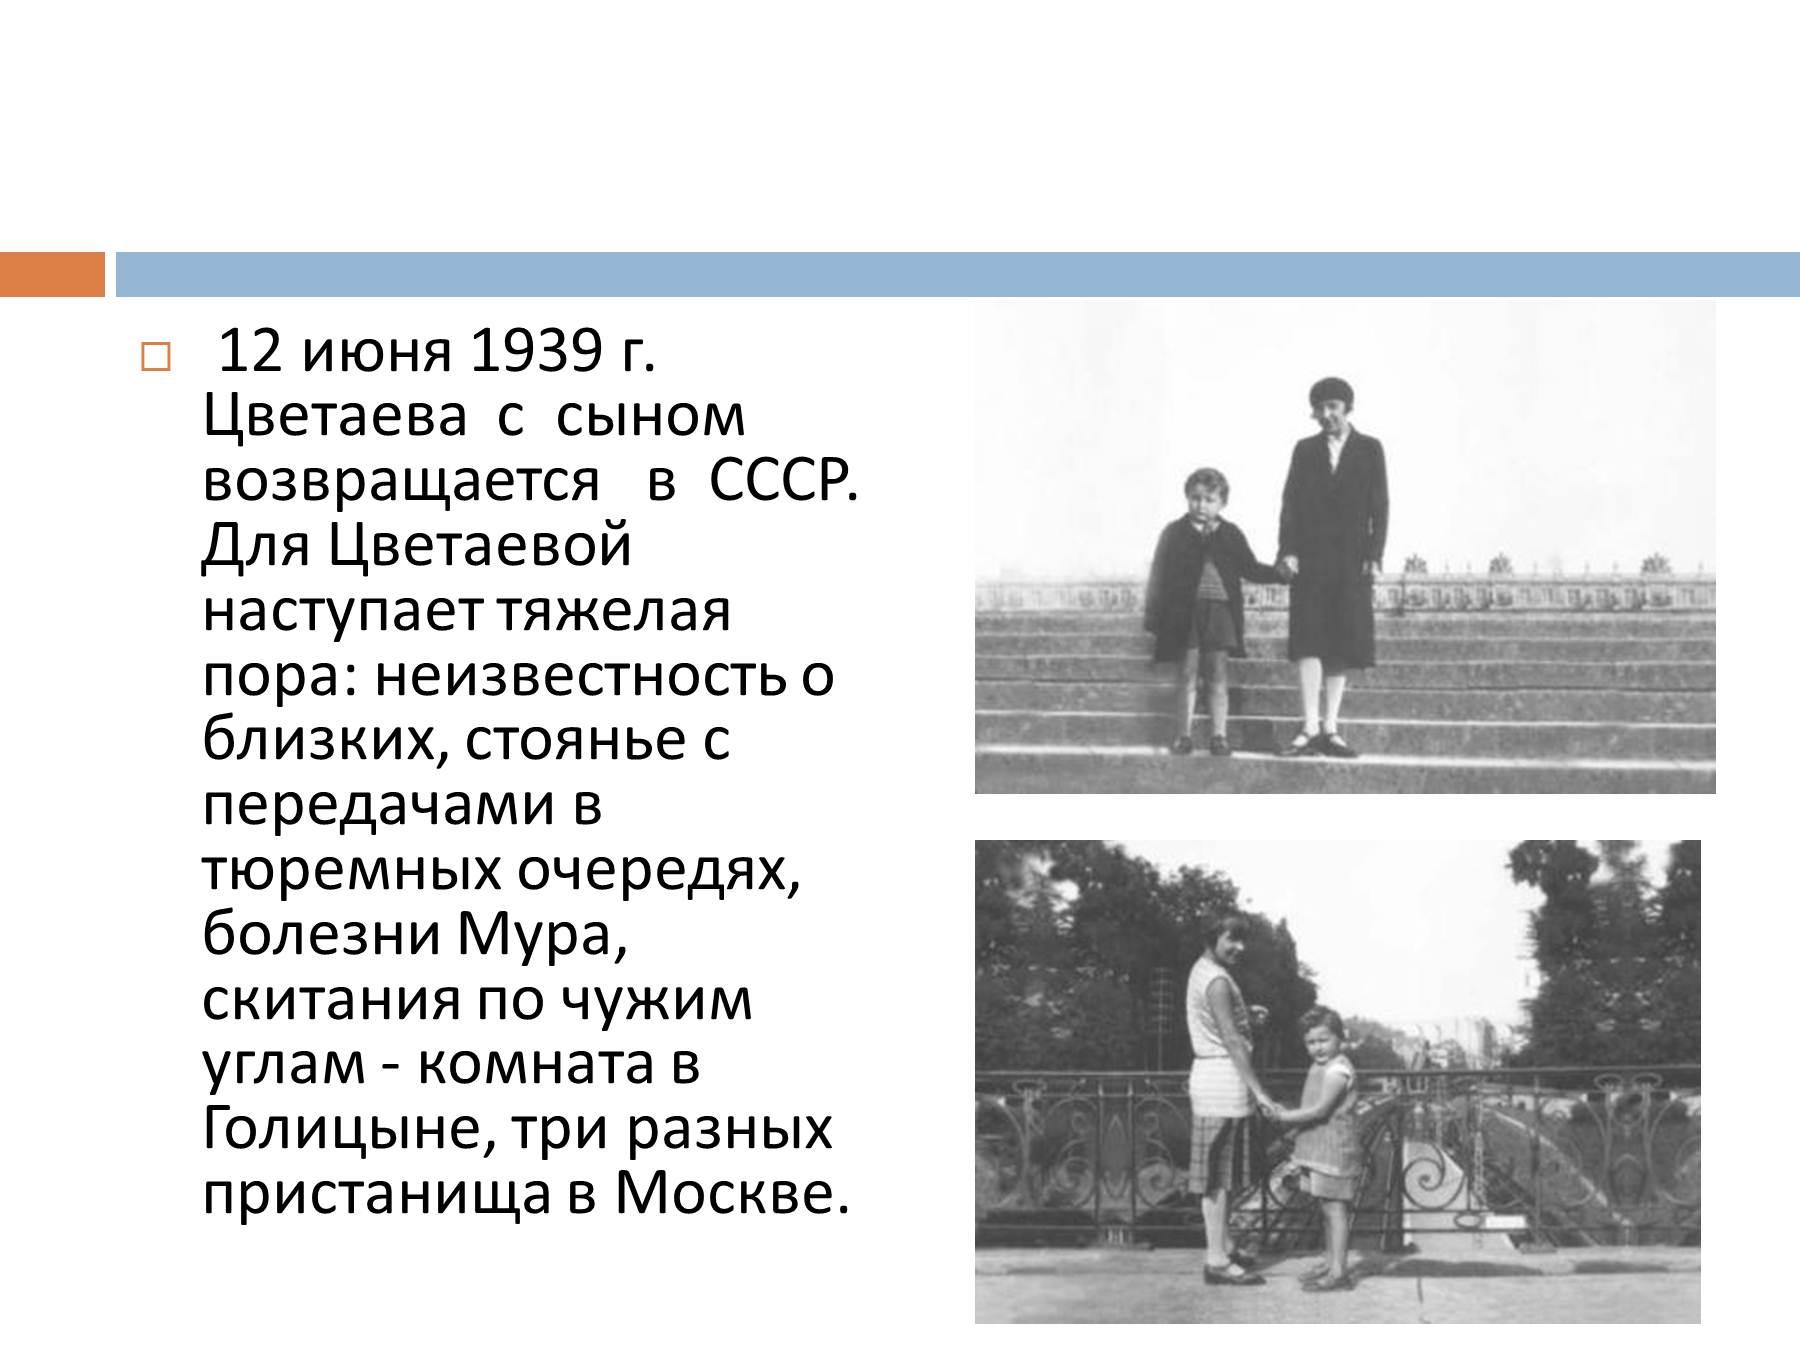 tsvetaeva-bila-lesbiyankoy